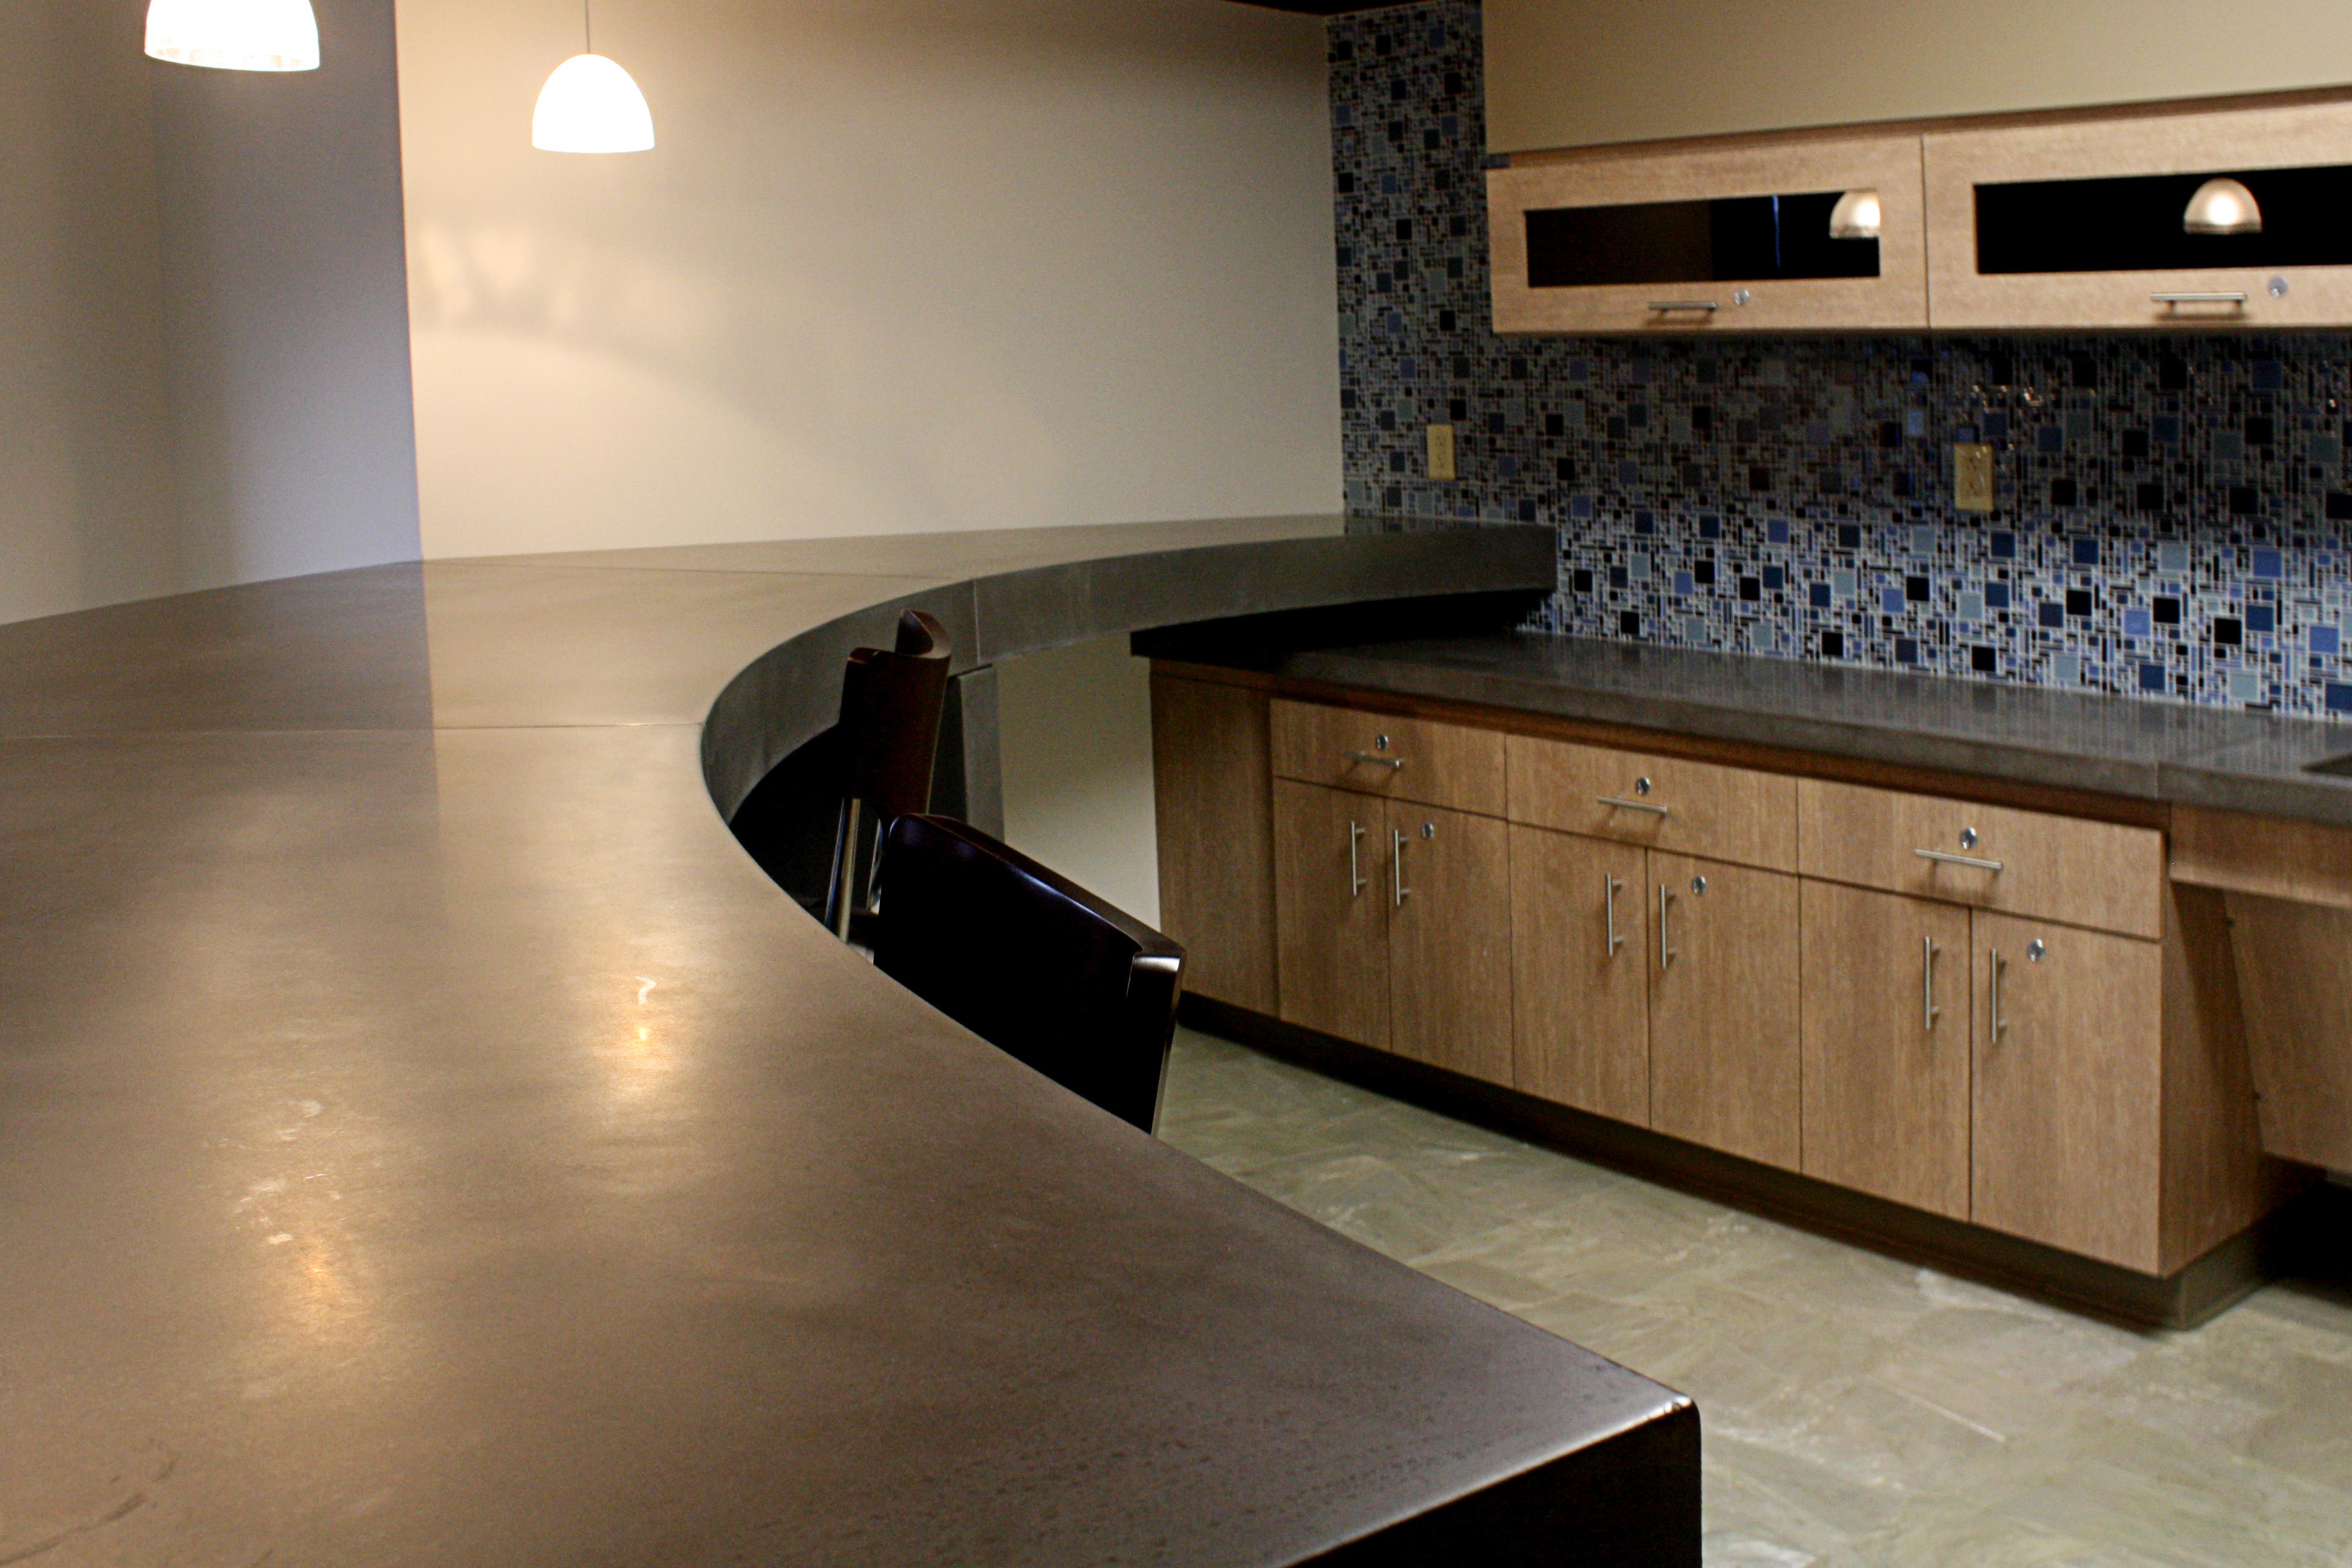 Commercial Concrete Countertop